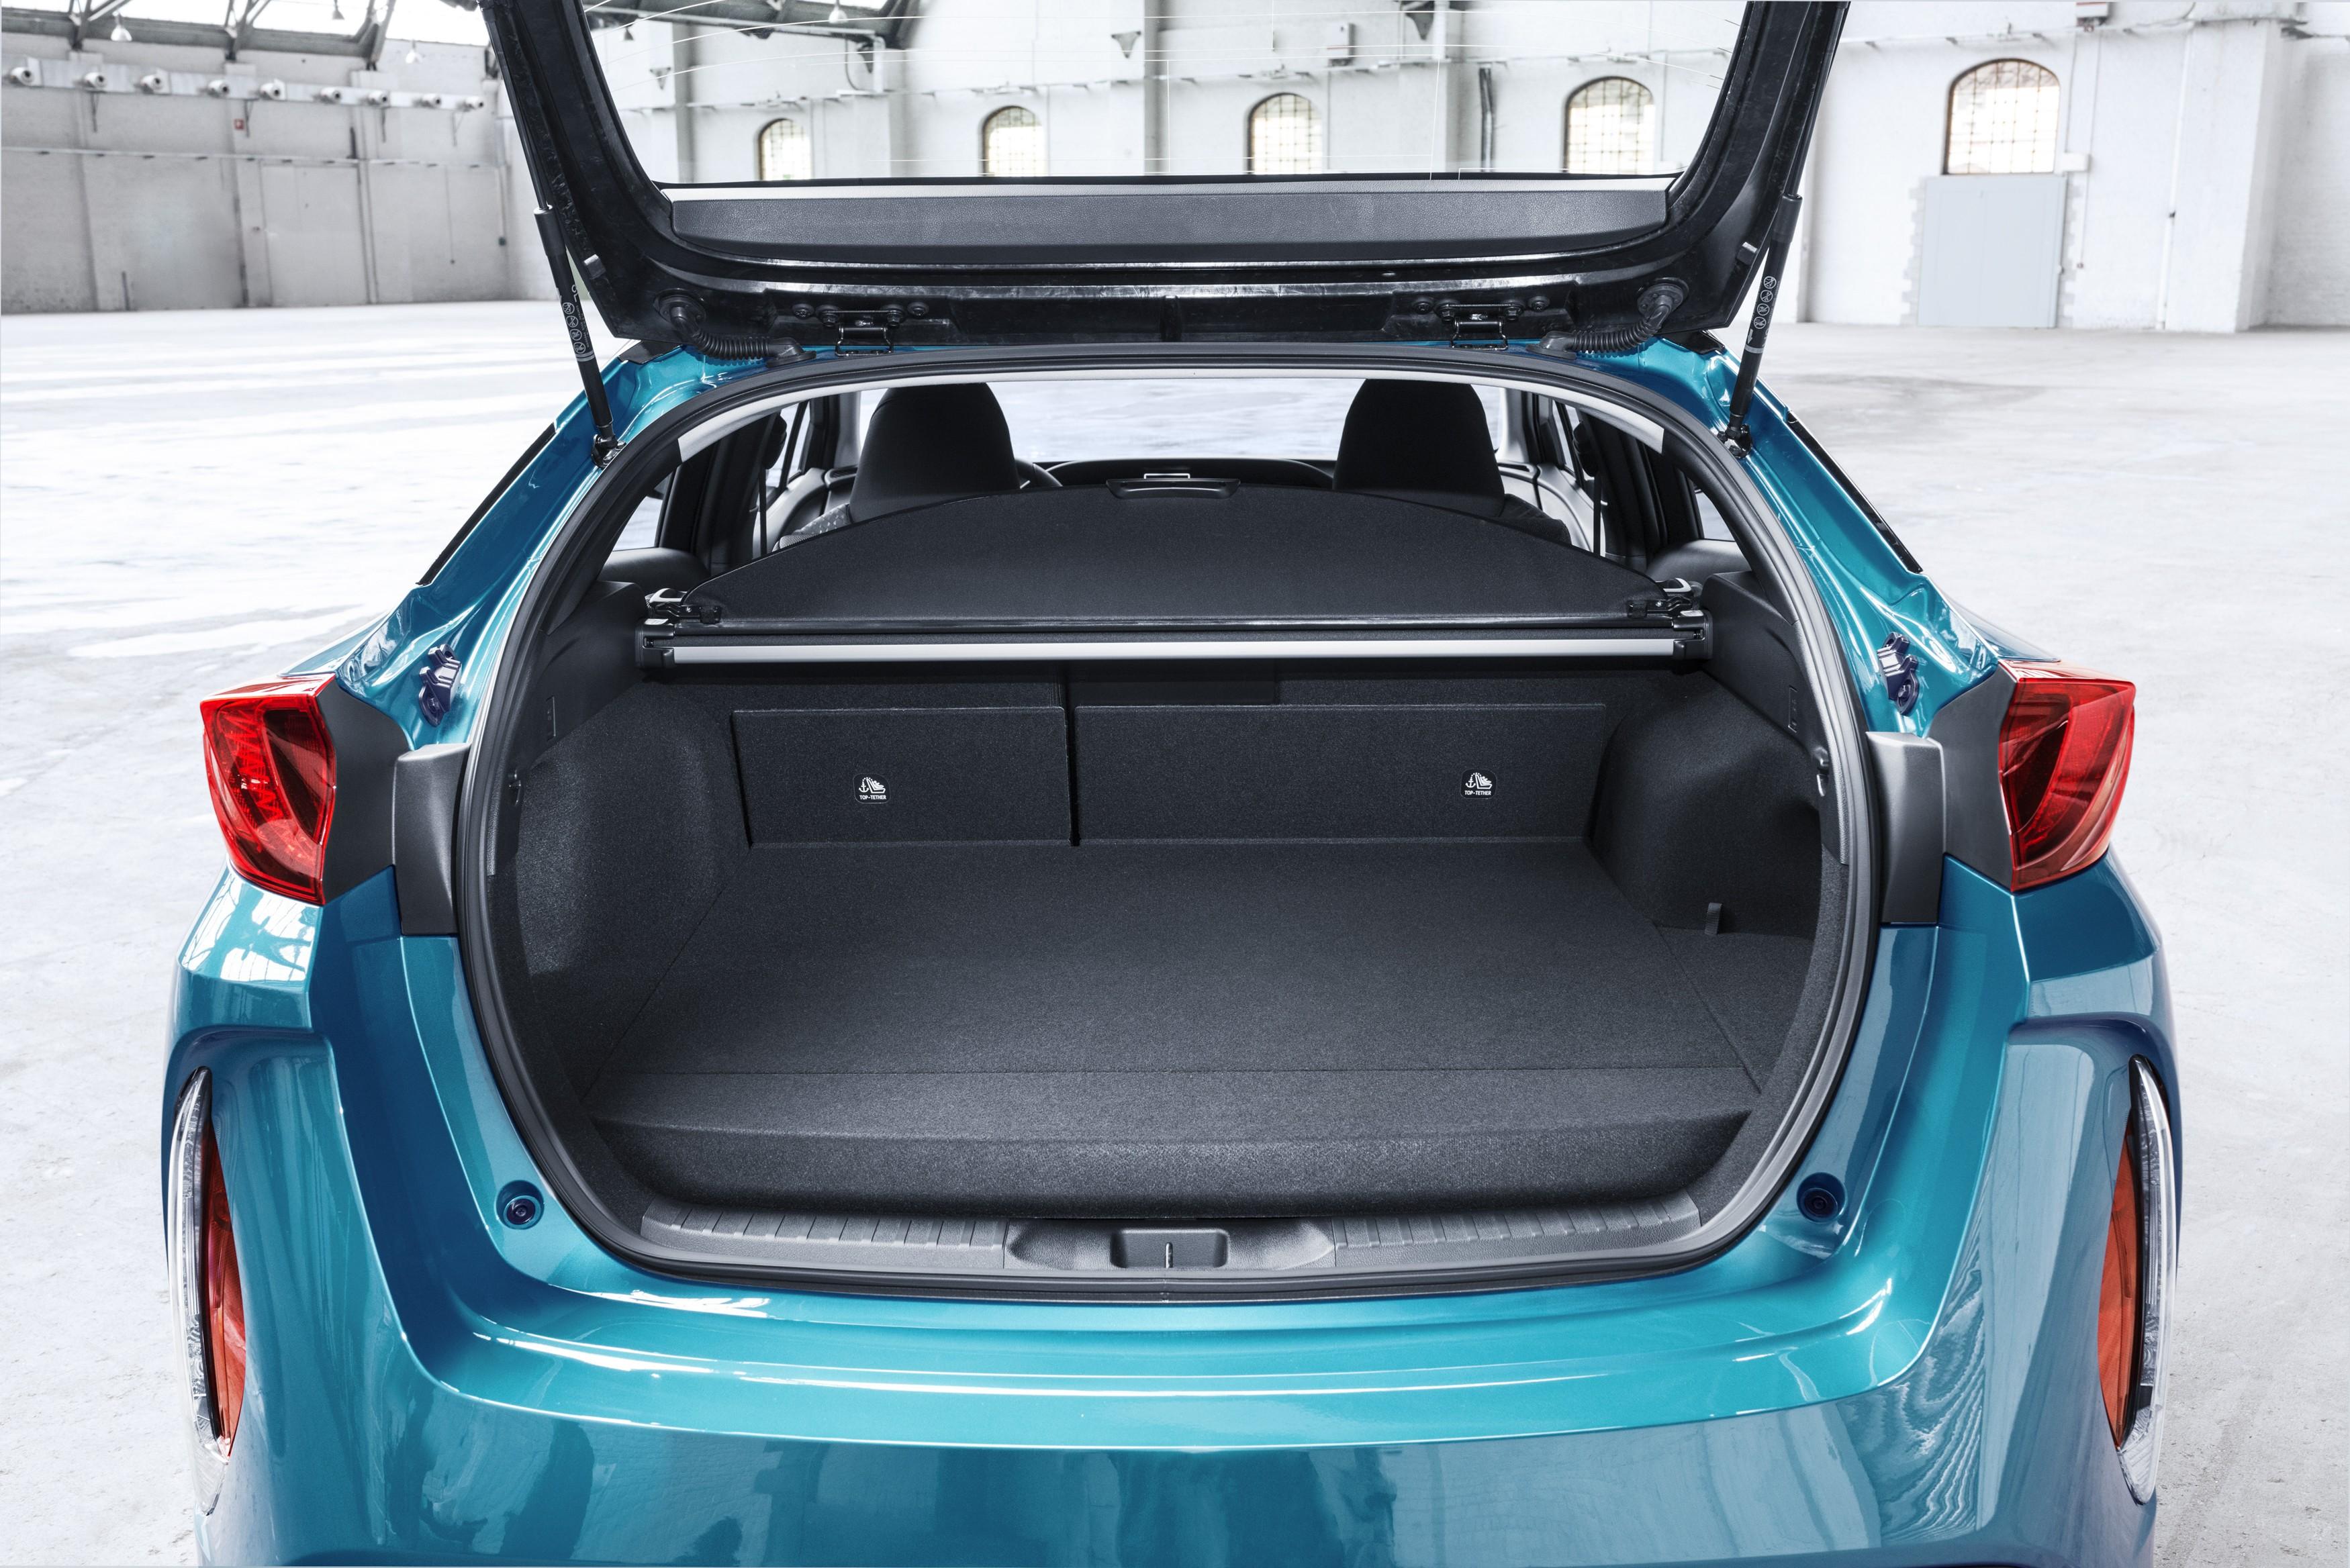 2017 Toyota Prius Plug In Hybrid Goes On Sale In Europe